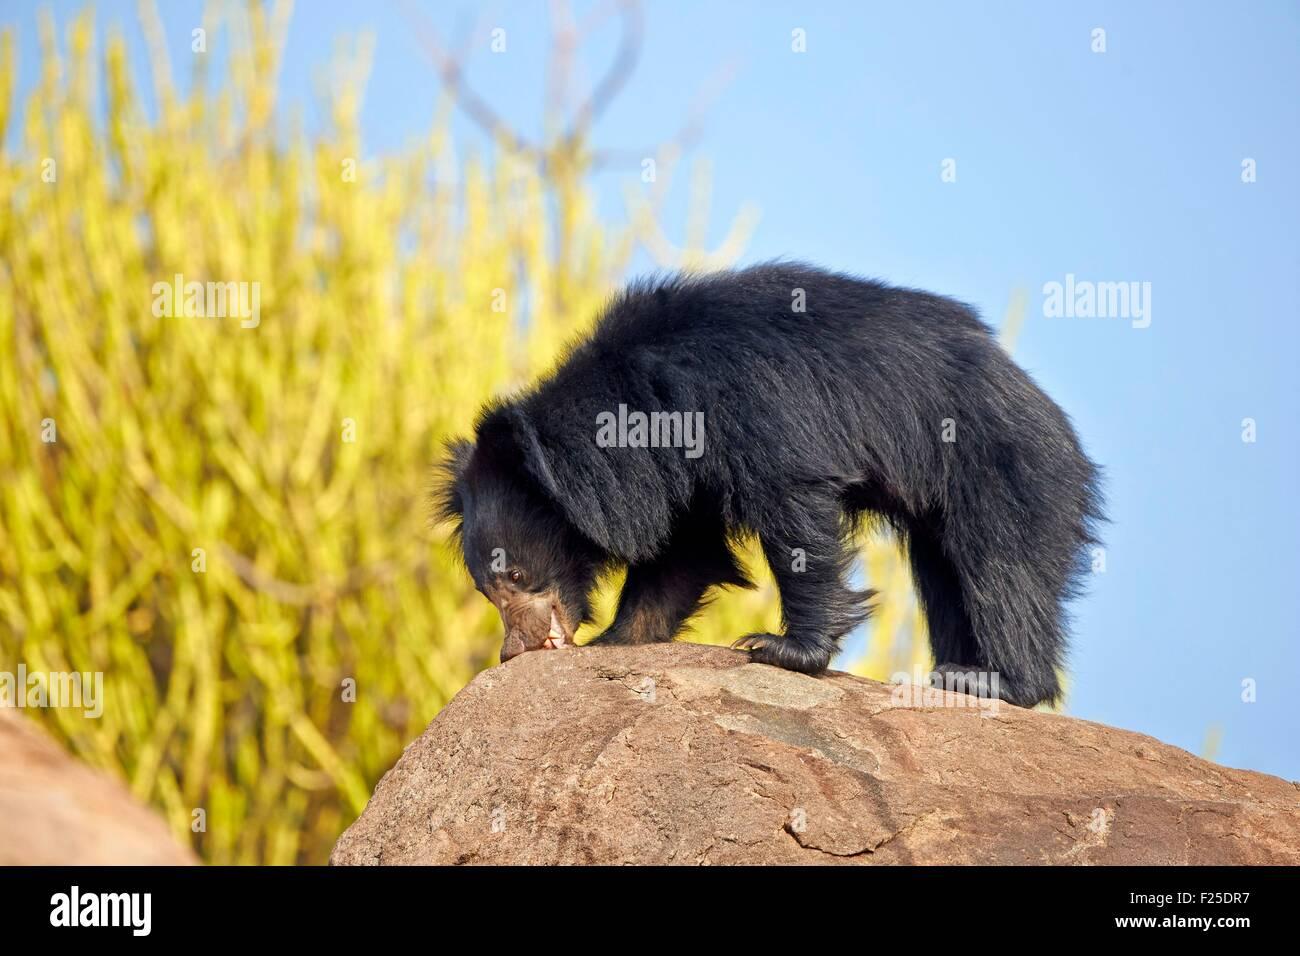 L'Asie, l'Inde, Karnataka, ours lippu ou ours lippu de l'Inde (Melursus ursinus) ours (Melursus ursinus) Photo Stock